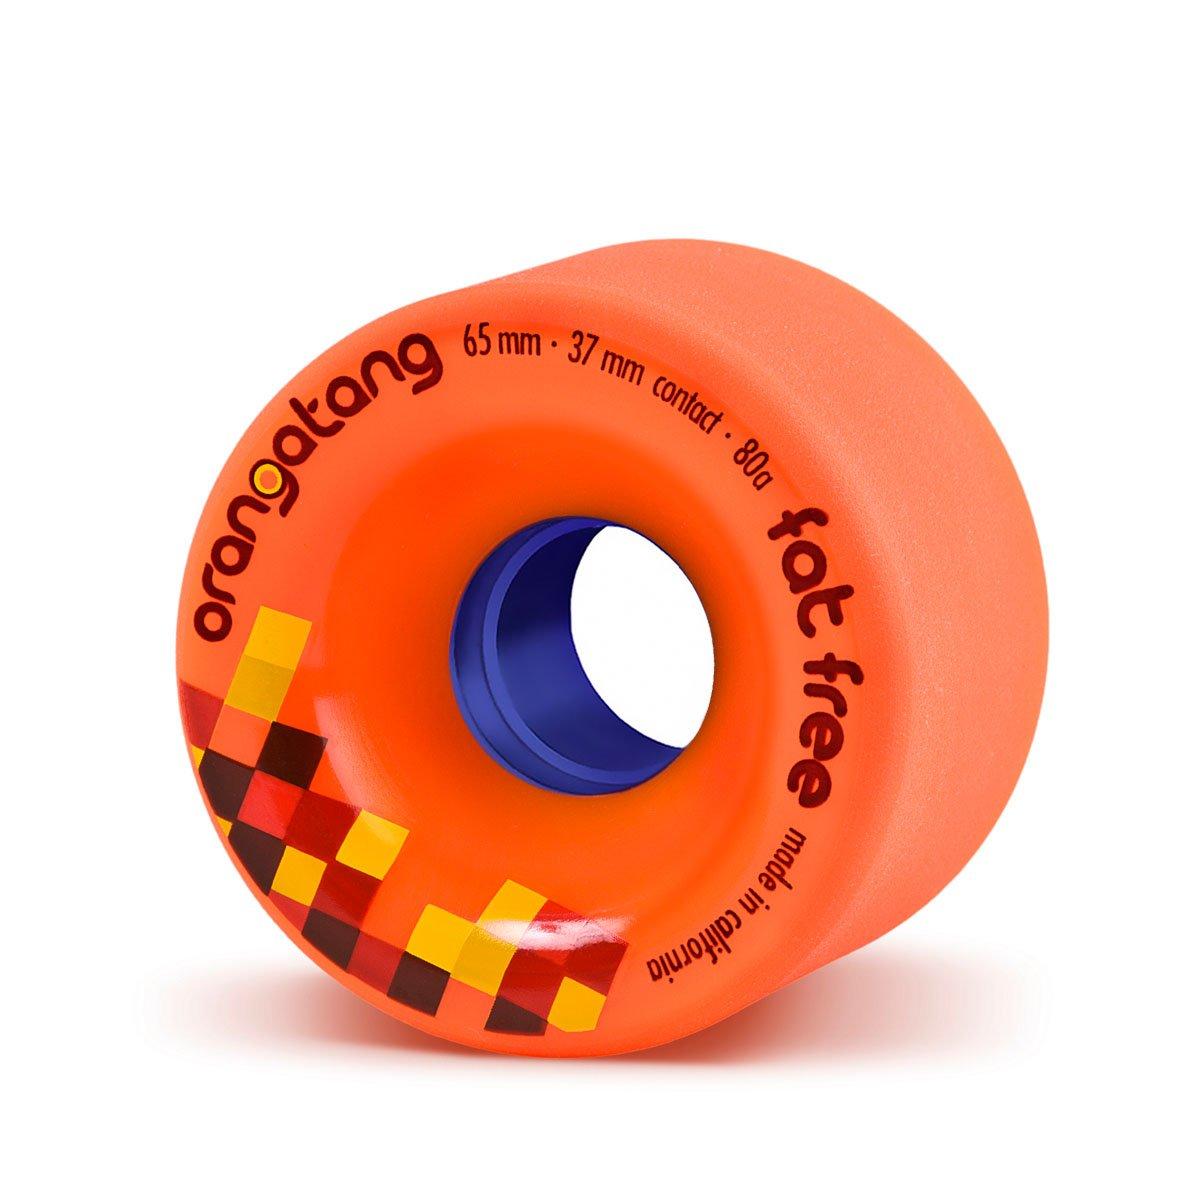 Orangatang Fat Free 65 mm Freeride Longboard ruedas de skateboard (juego de 4)